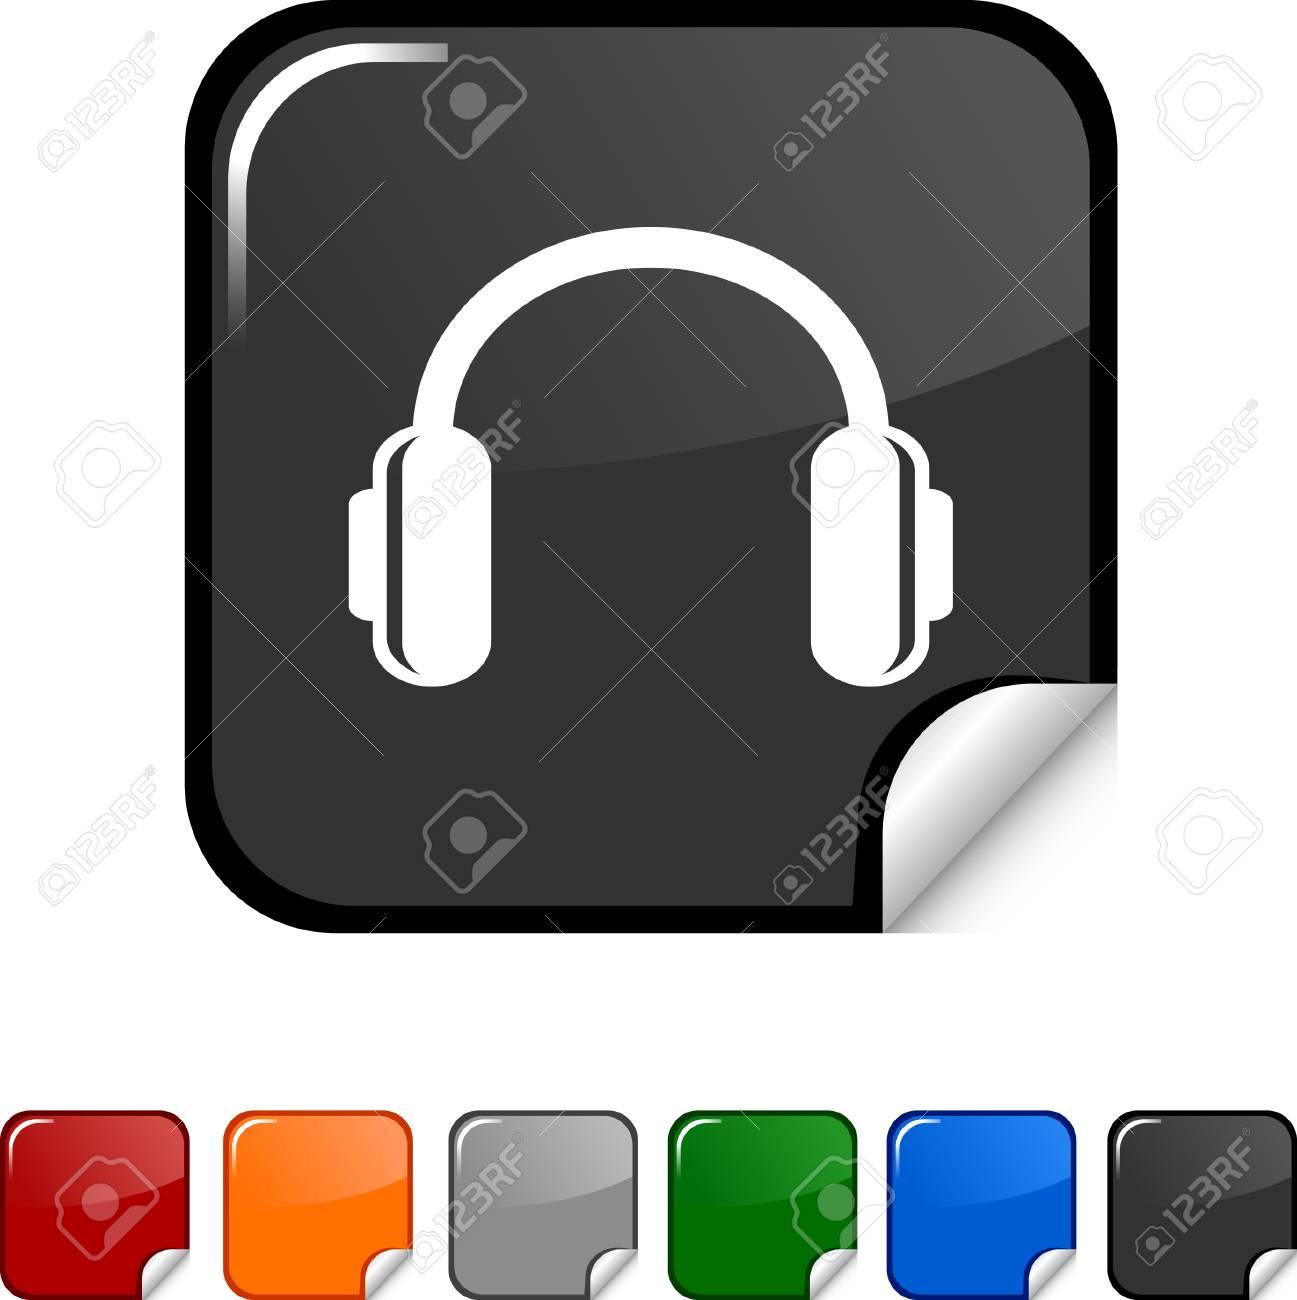 headphones  sticker icon. Vector illustration. Stock Vector - 5617889